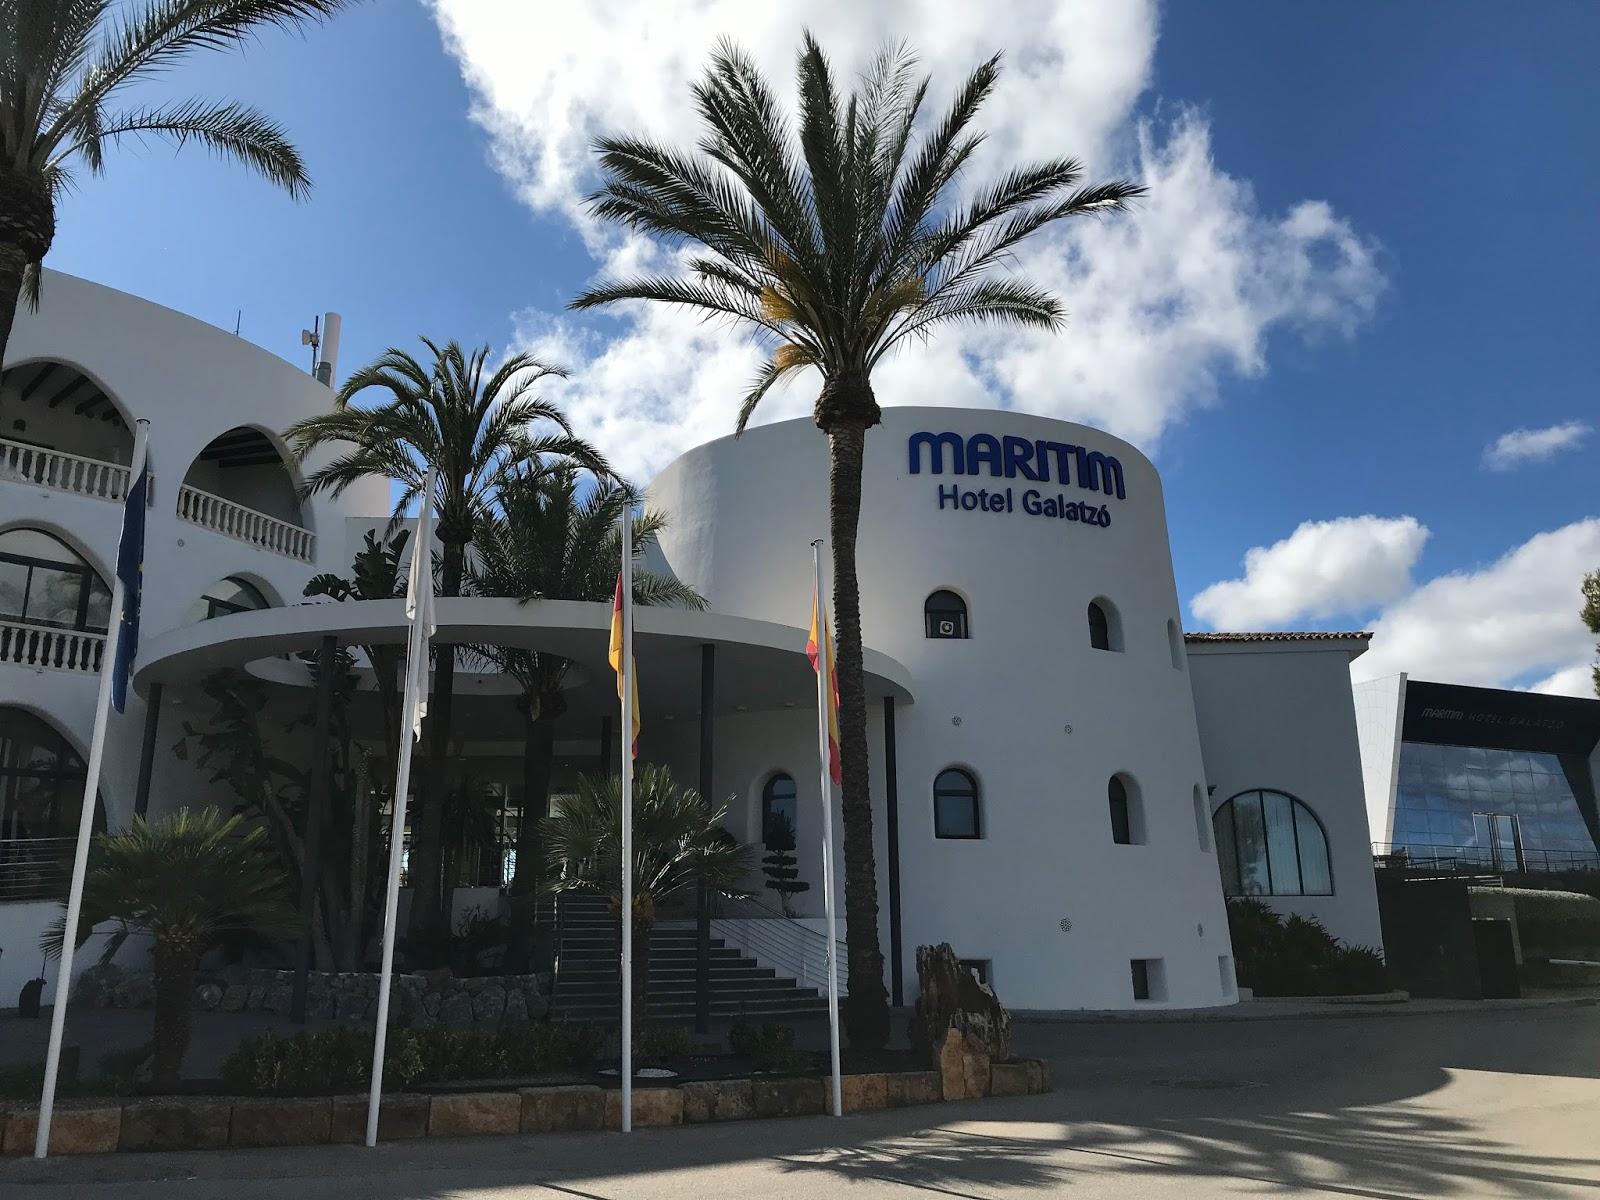 Maritim Hotel Galatzo Entrance